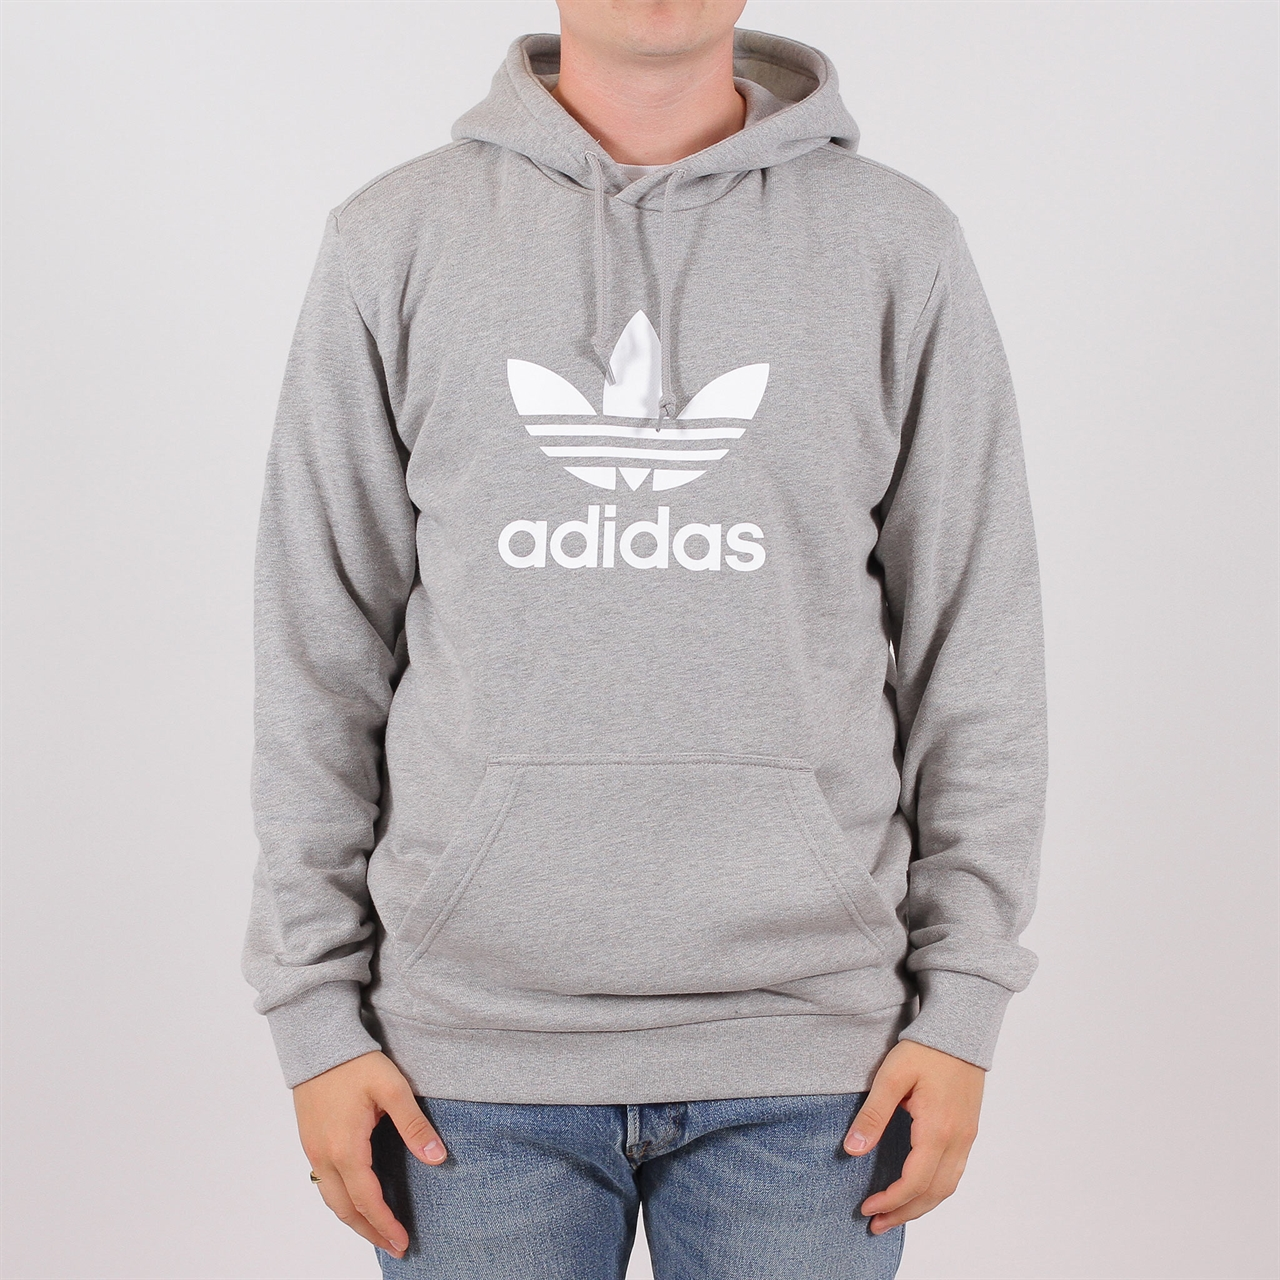 adidas sweater trefoil